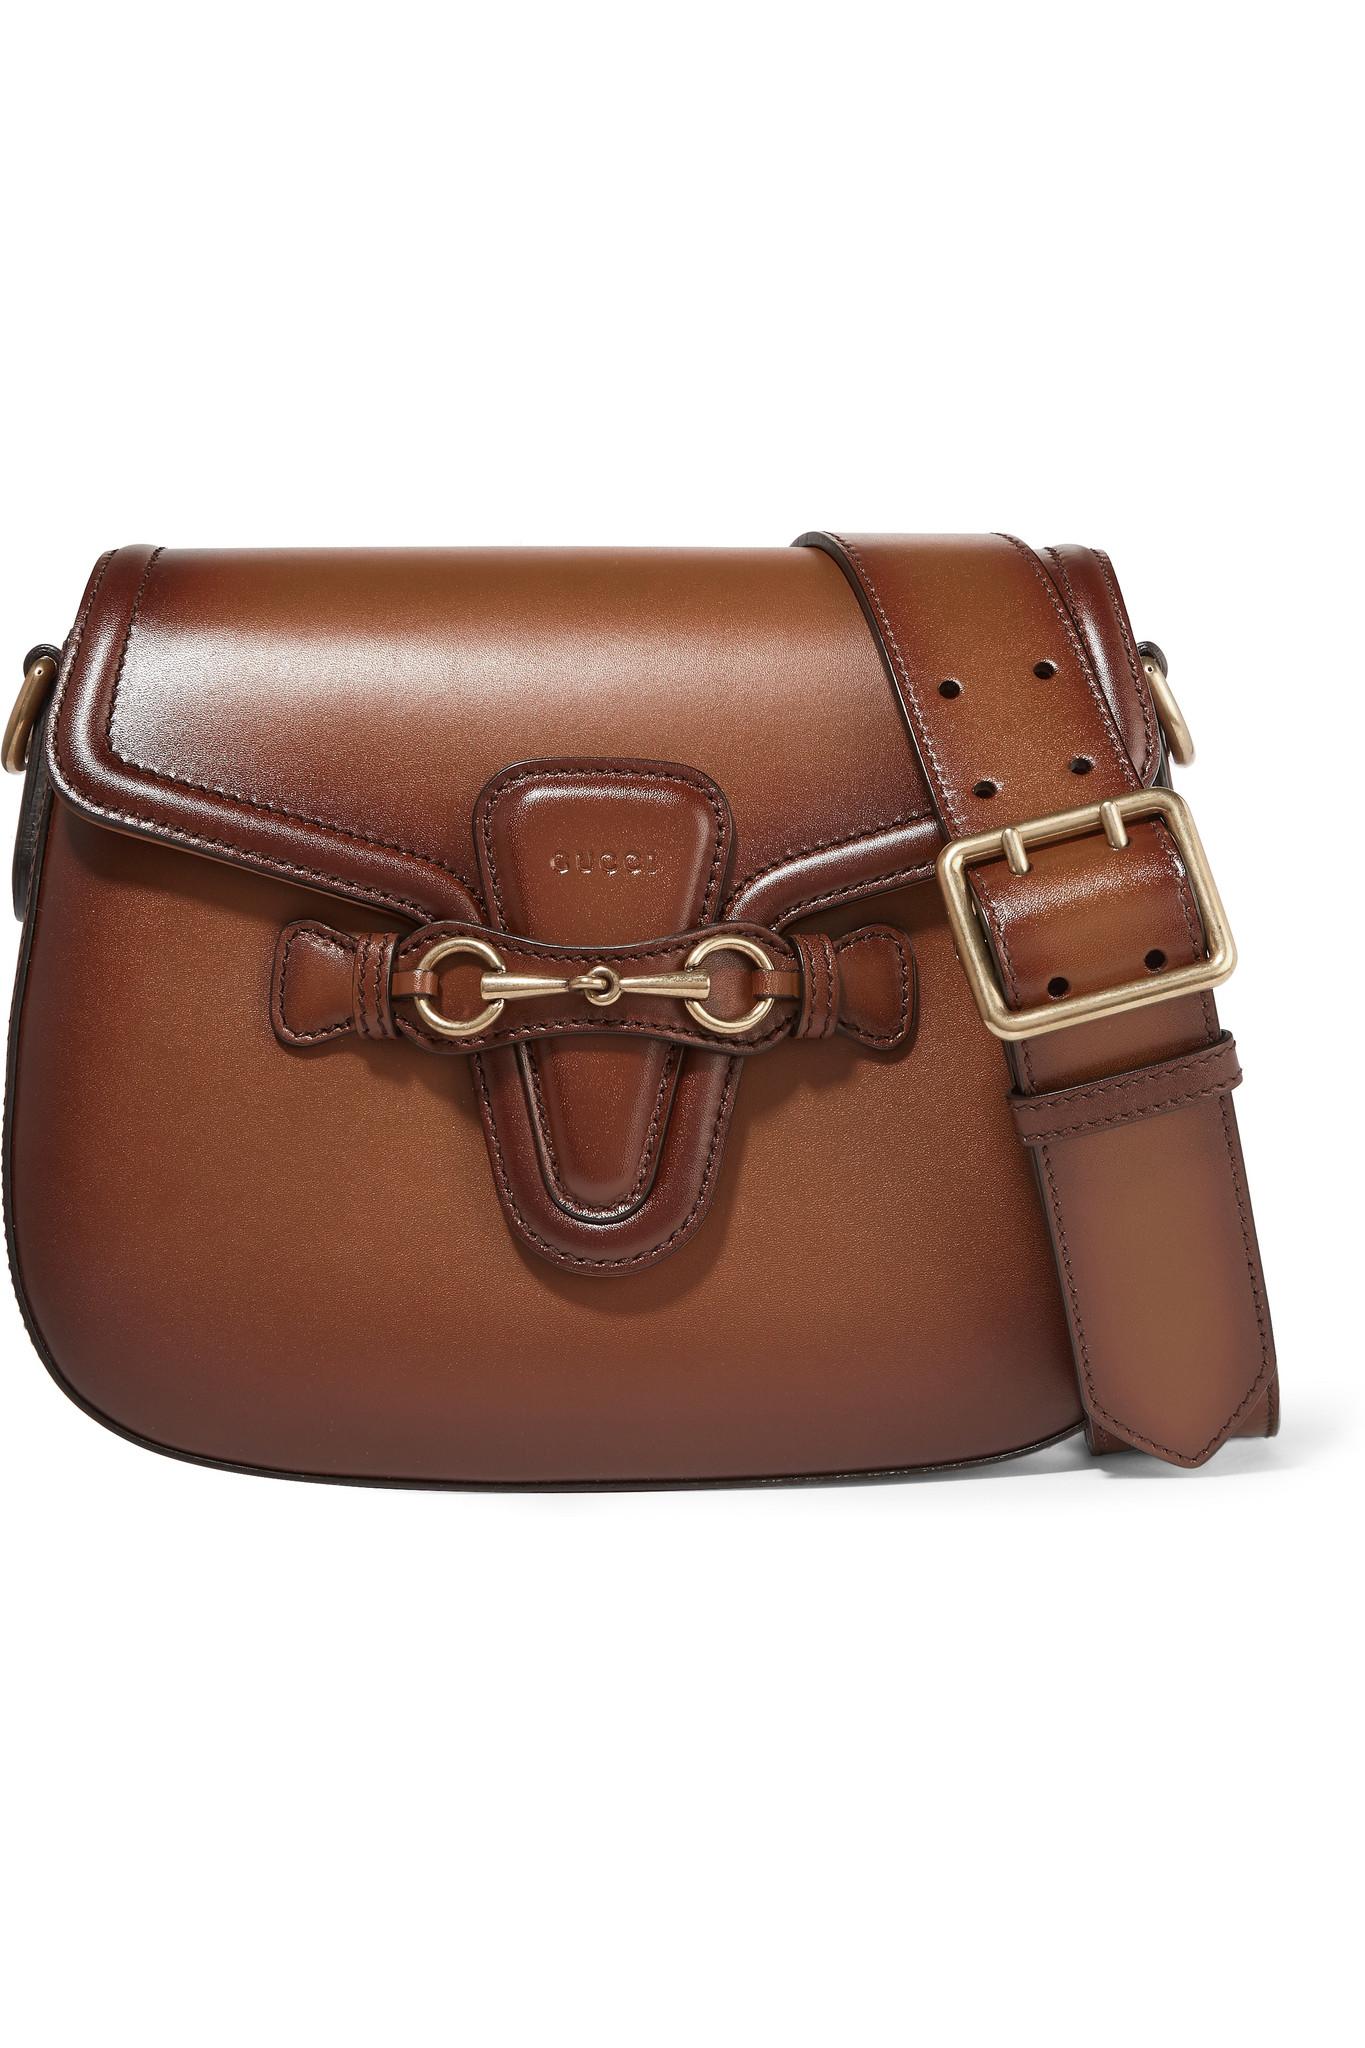 Gucci Small Brown Leather Purse - Best Purse Image Ccdbb.Org 106e9cbdeb4d2